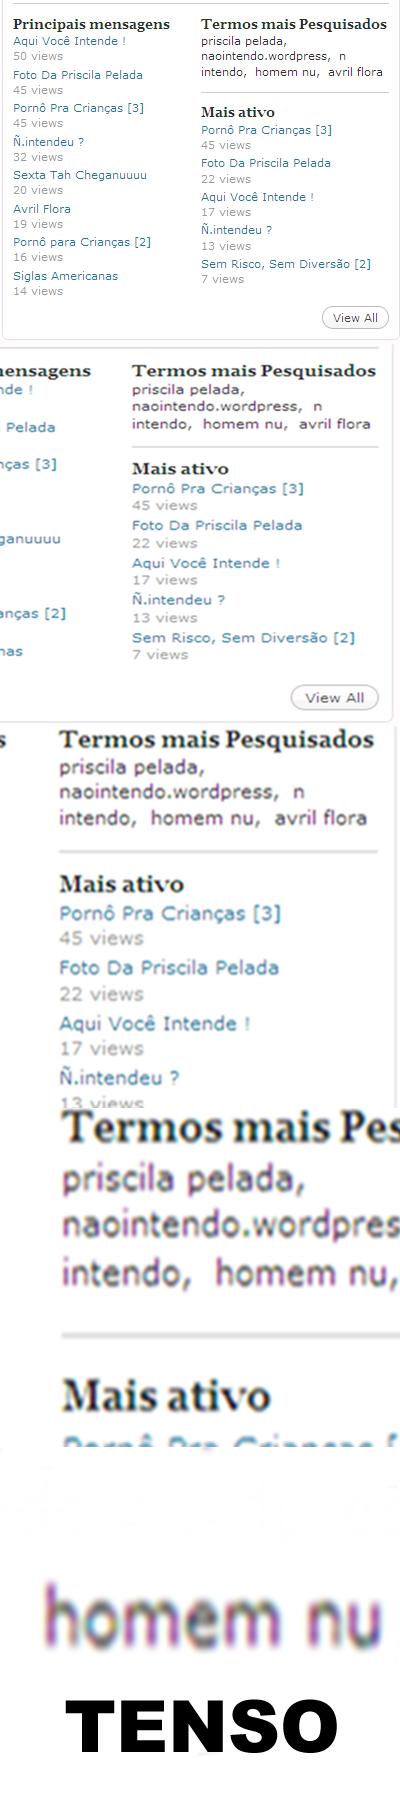 tenso-blog